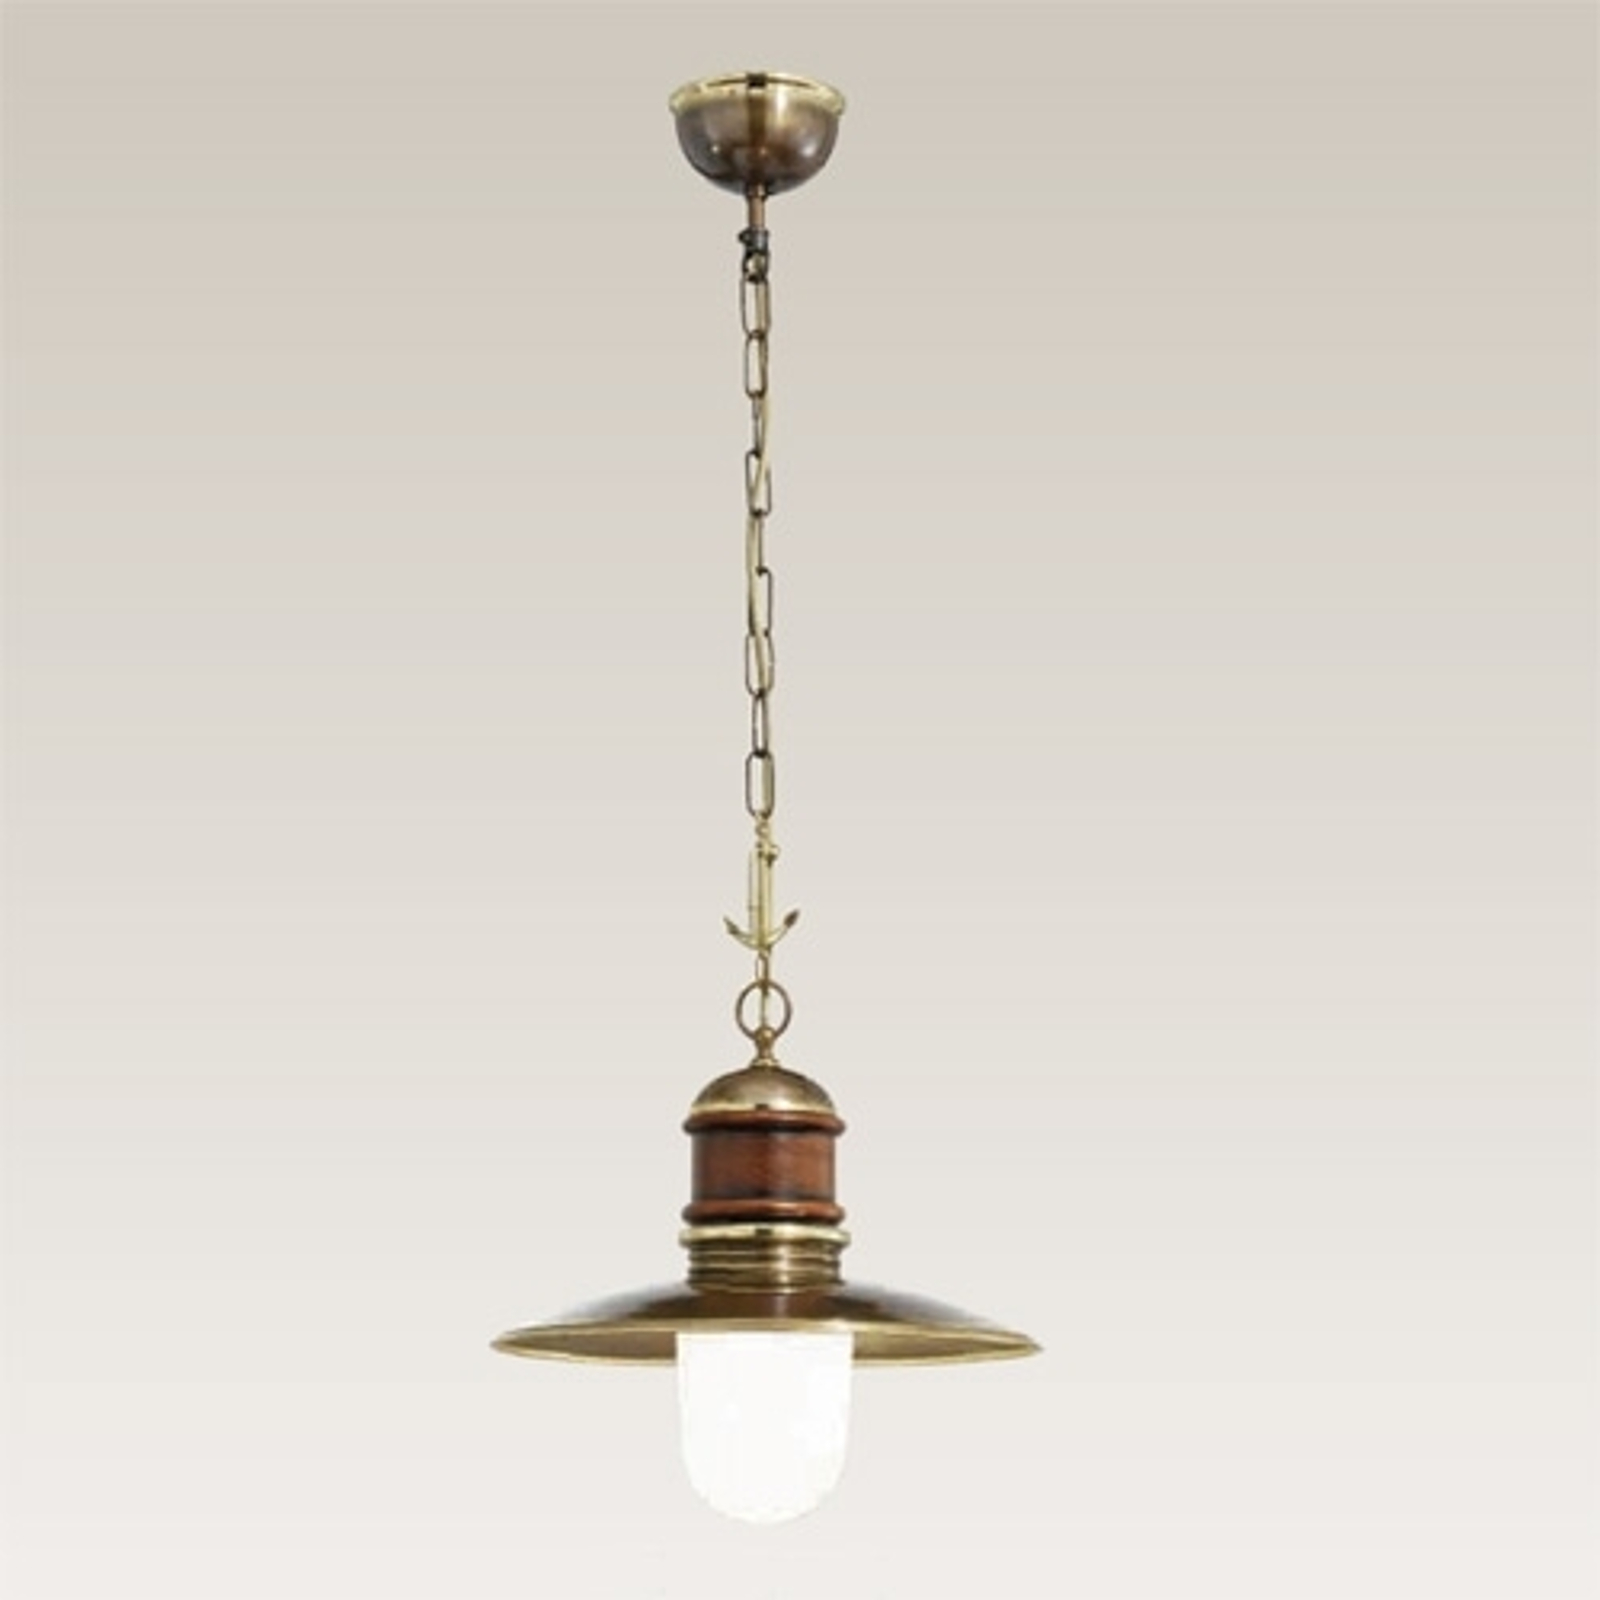 1-punktowa lampa wisząca Faro